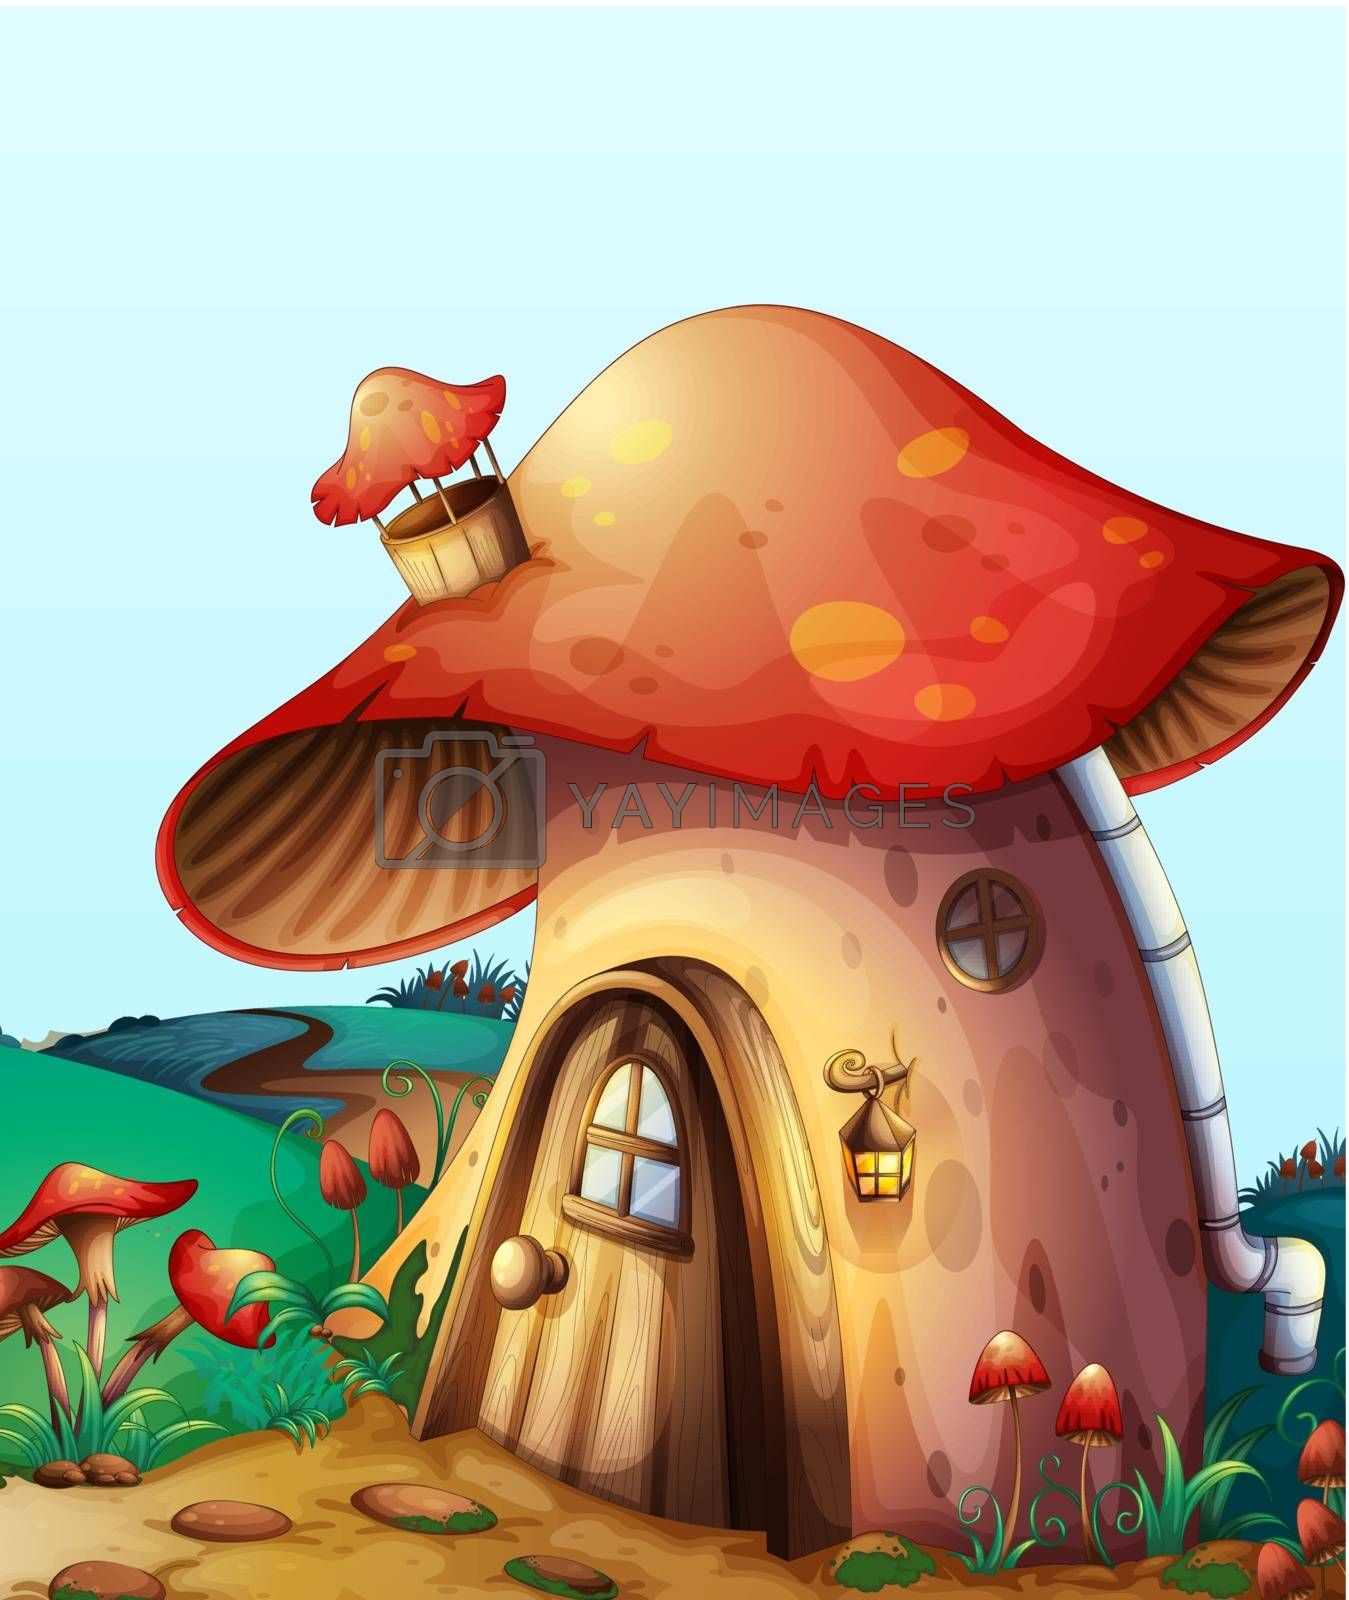 illustration of red mushroom house on a blue background